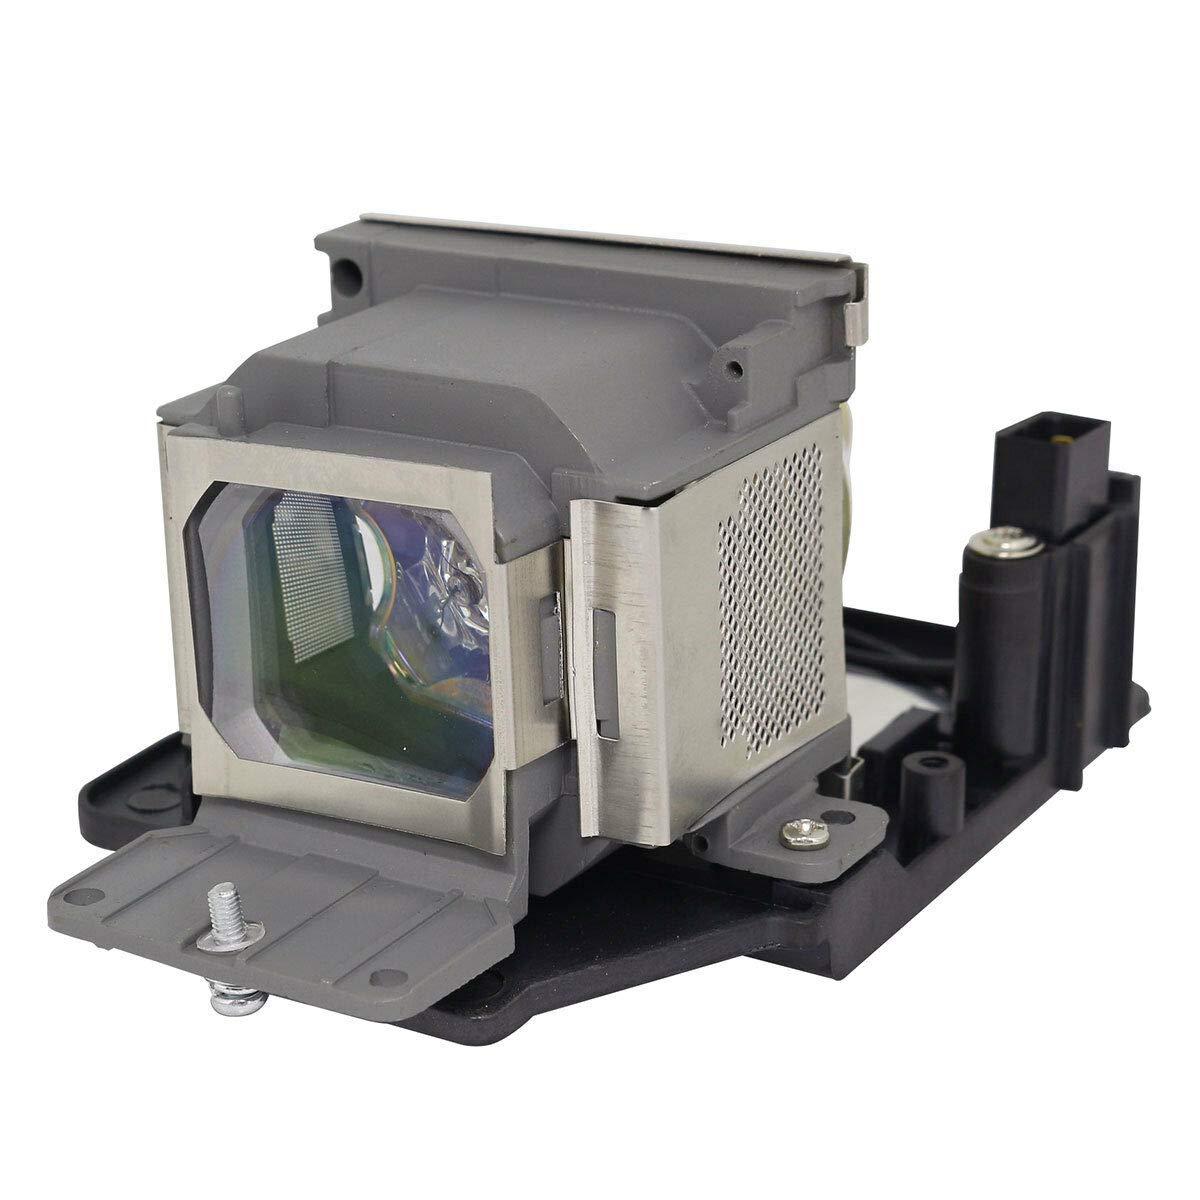 CTLAMP LMP-E212 オリジナルランプバルブ ハウジング付き Sony VPL-EW225 / VPL-EW226 / VPL-EW245 / VPL-EW246 / VPL-EW275 / VPL-EW276に対応   B07P8Z6L8D